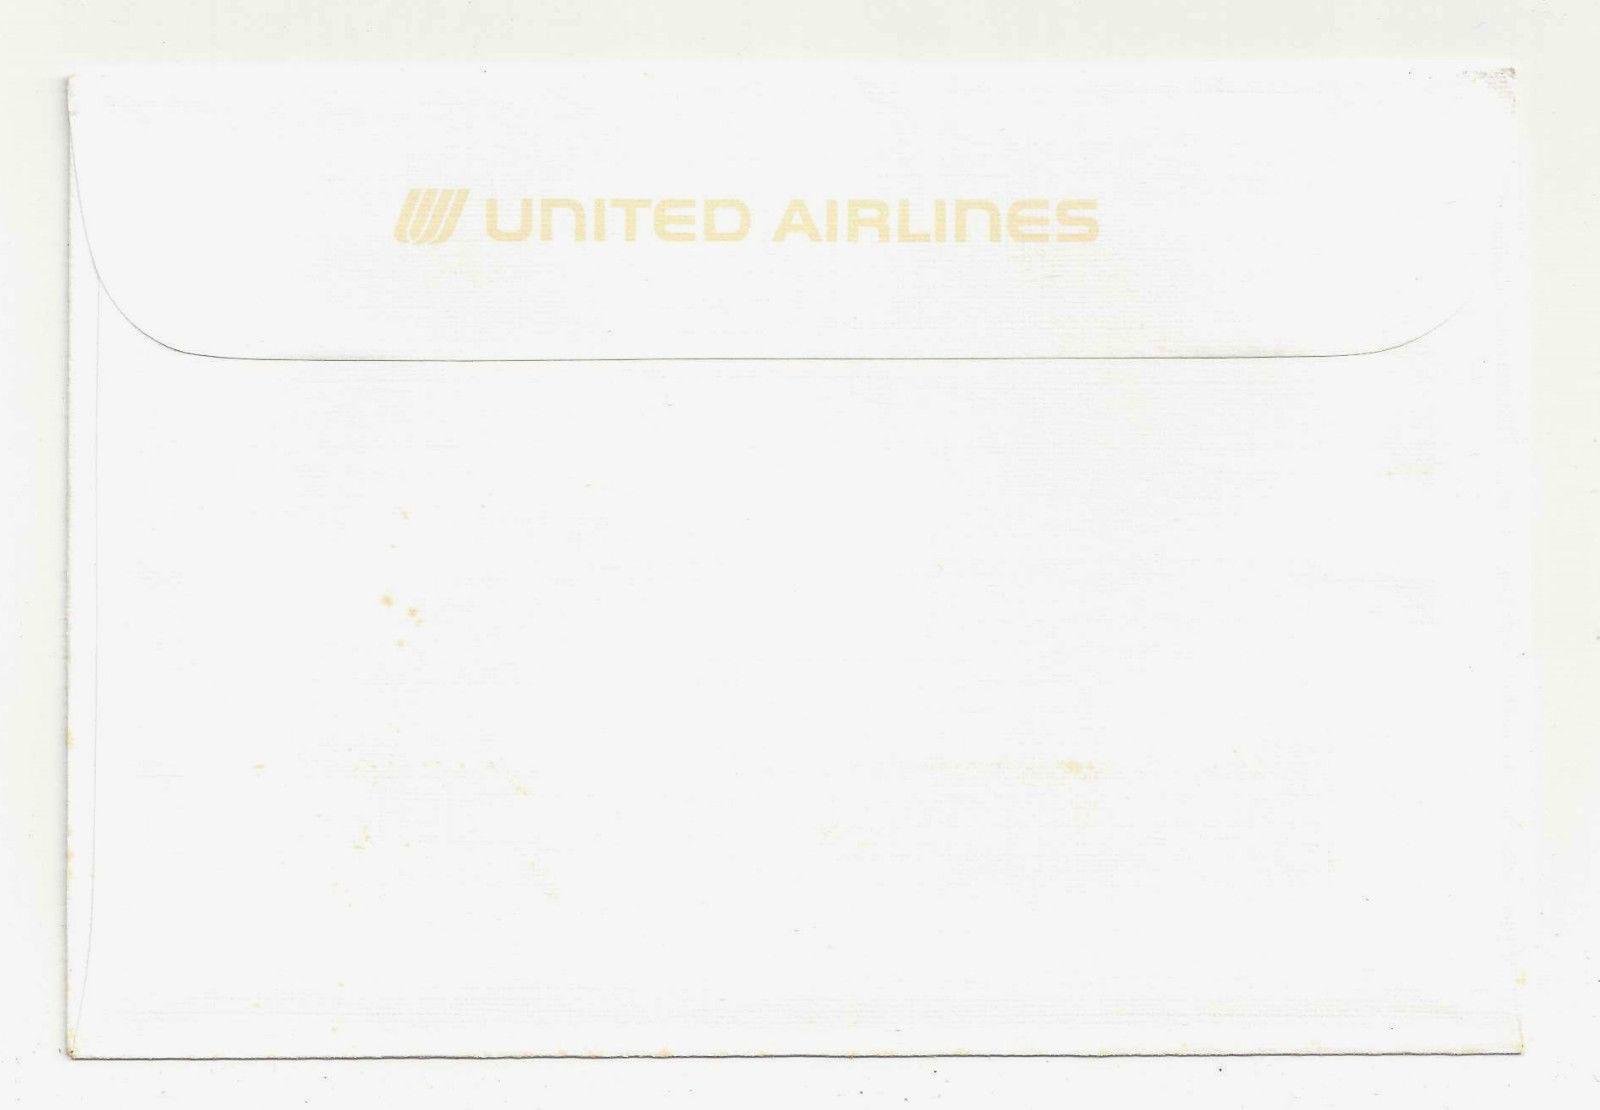 United Airlines Ford Tri-Motor 5-AT-D Roy Anderson Vtg Ad Postcard w Envelope